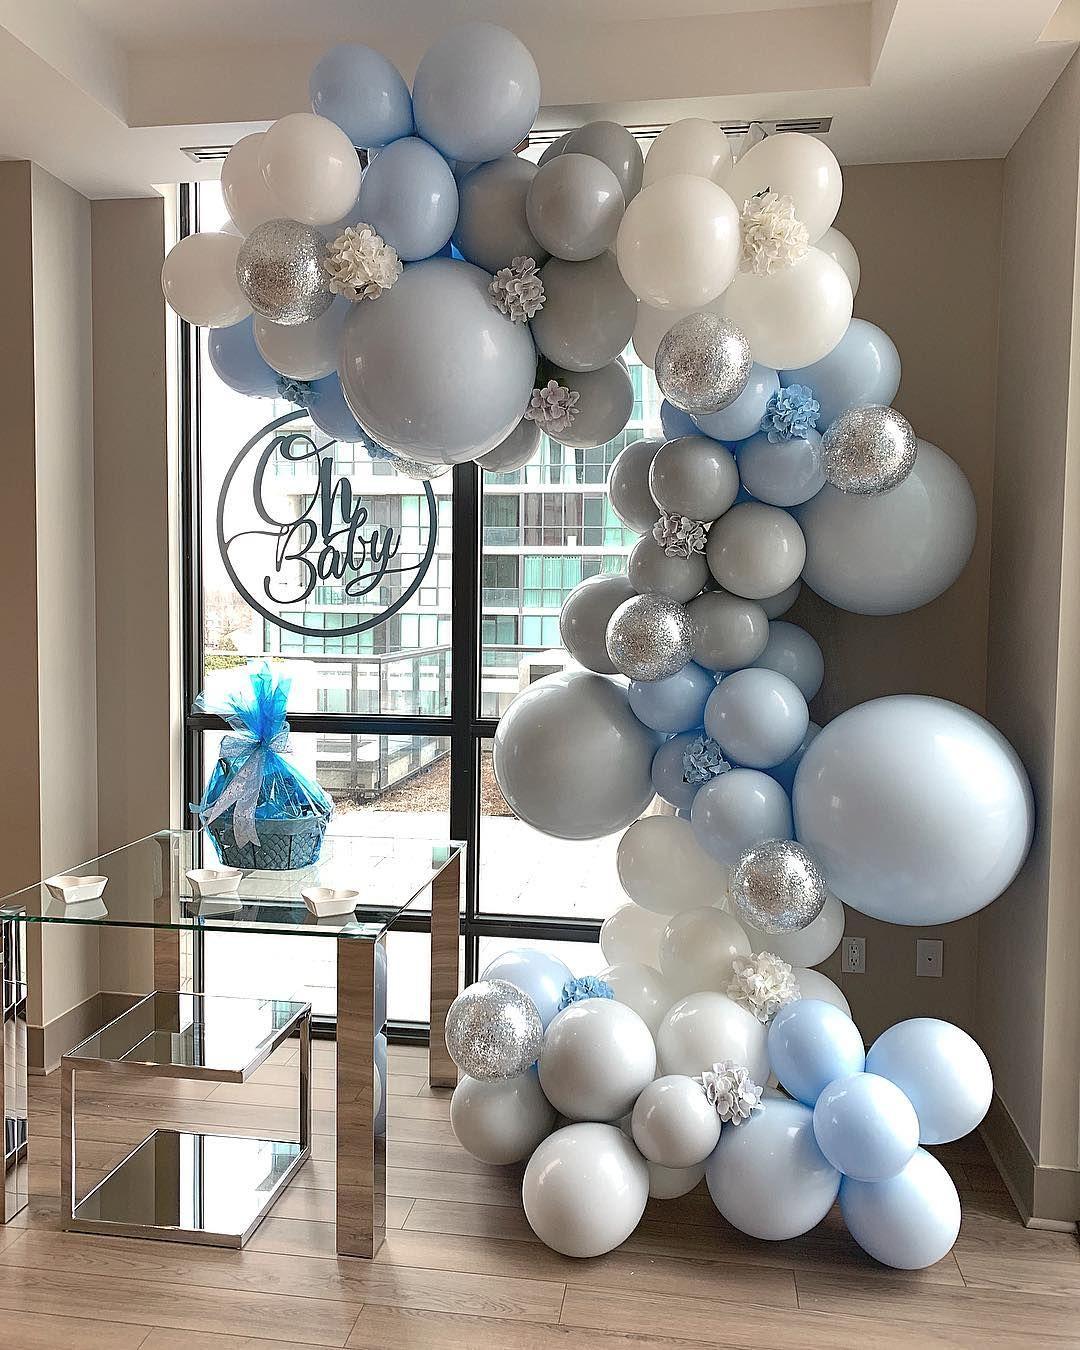 "Balloons by Dina on Instagram: ""Love the simplicity of this elegant setup.  Balloons @balloonsbydina . . . . . .  #balloongarland #balloondecor #babyshower…"" #winterwonderlandbabyshowerideas"